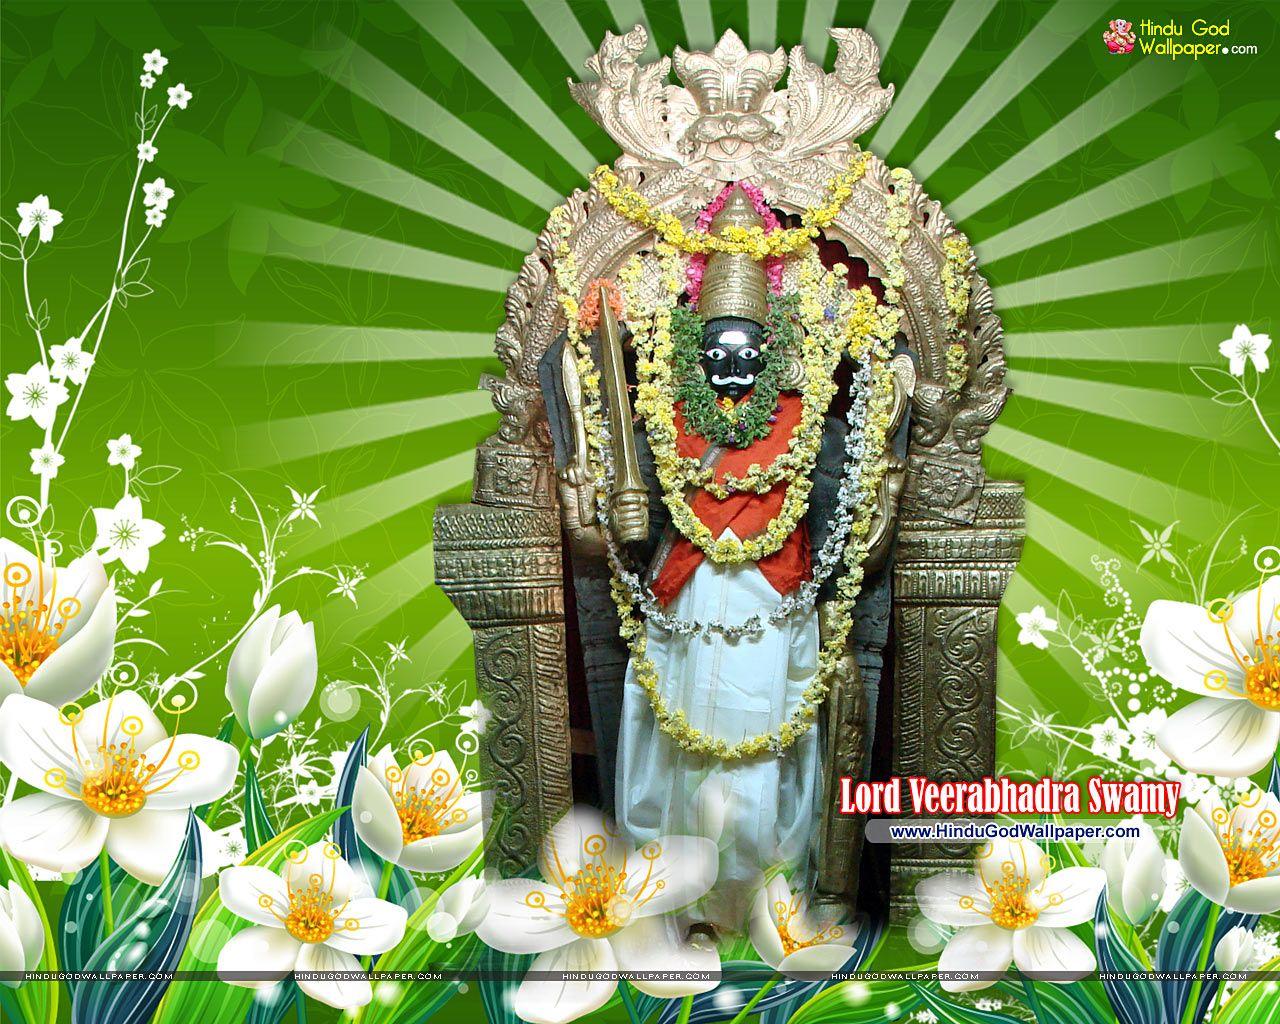 Veerabhadra Swamy Wallpapers, Images & Photos Download